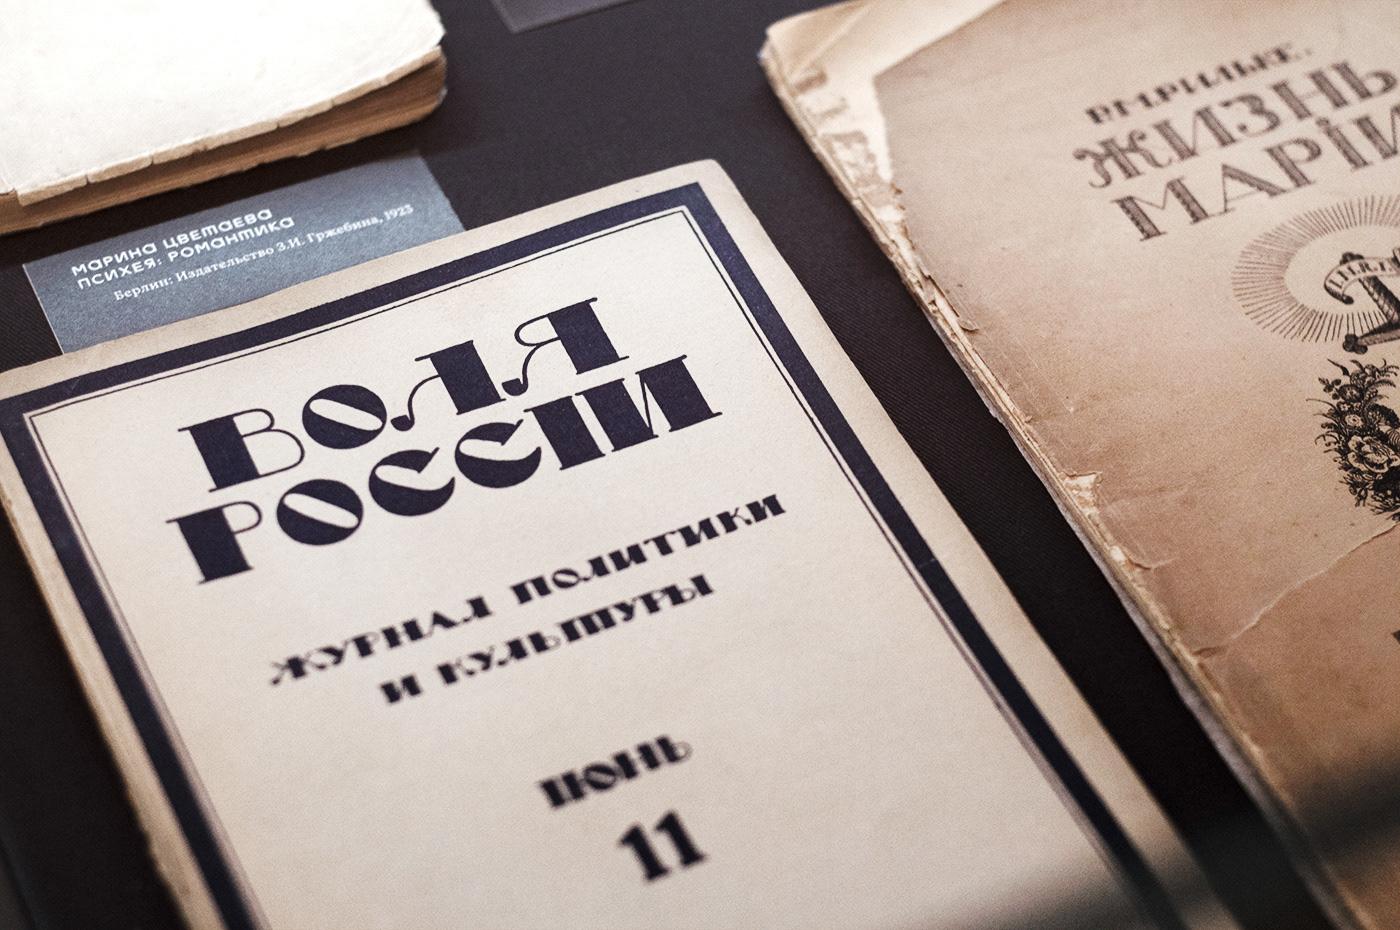 Publications by Irina Kosheleva 64